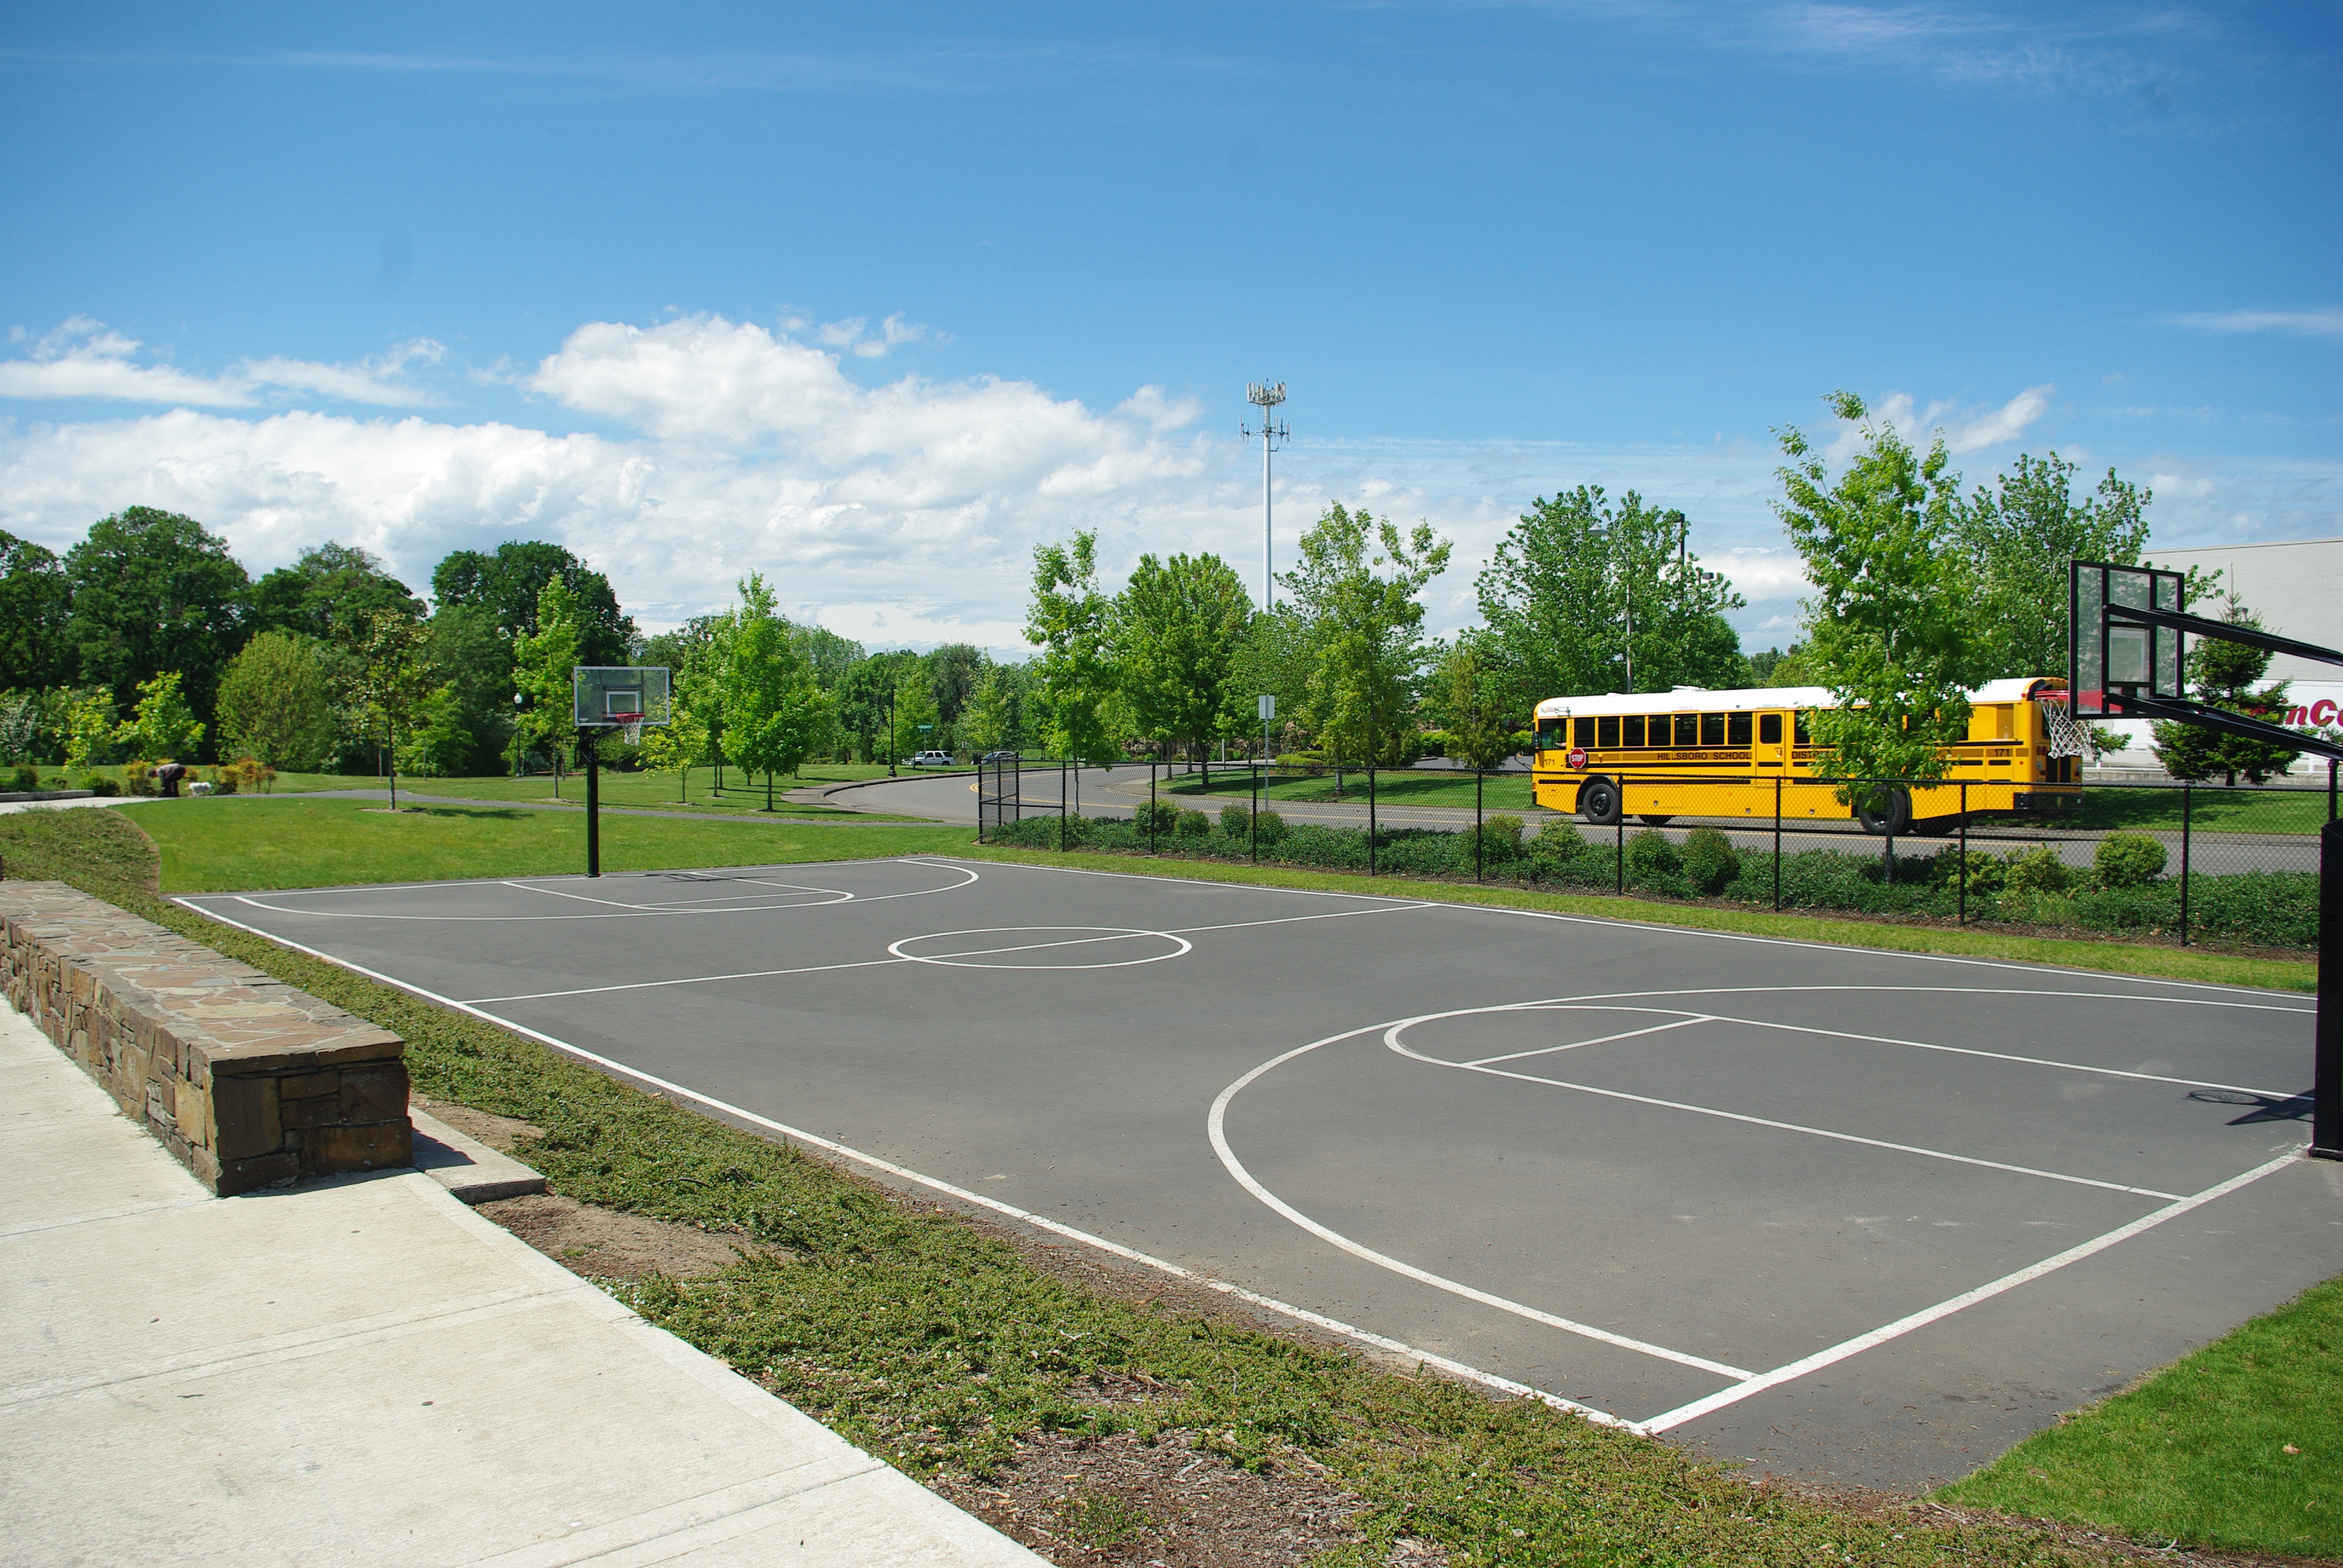 Wiki: Pitch (sports field) - upcScavenger